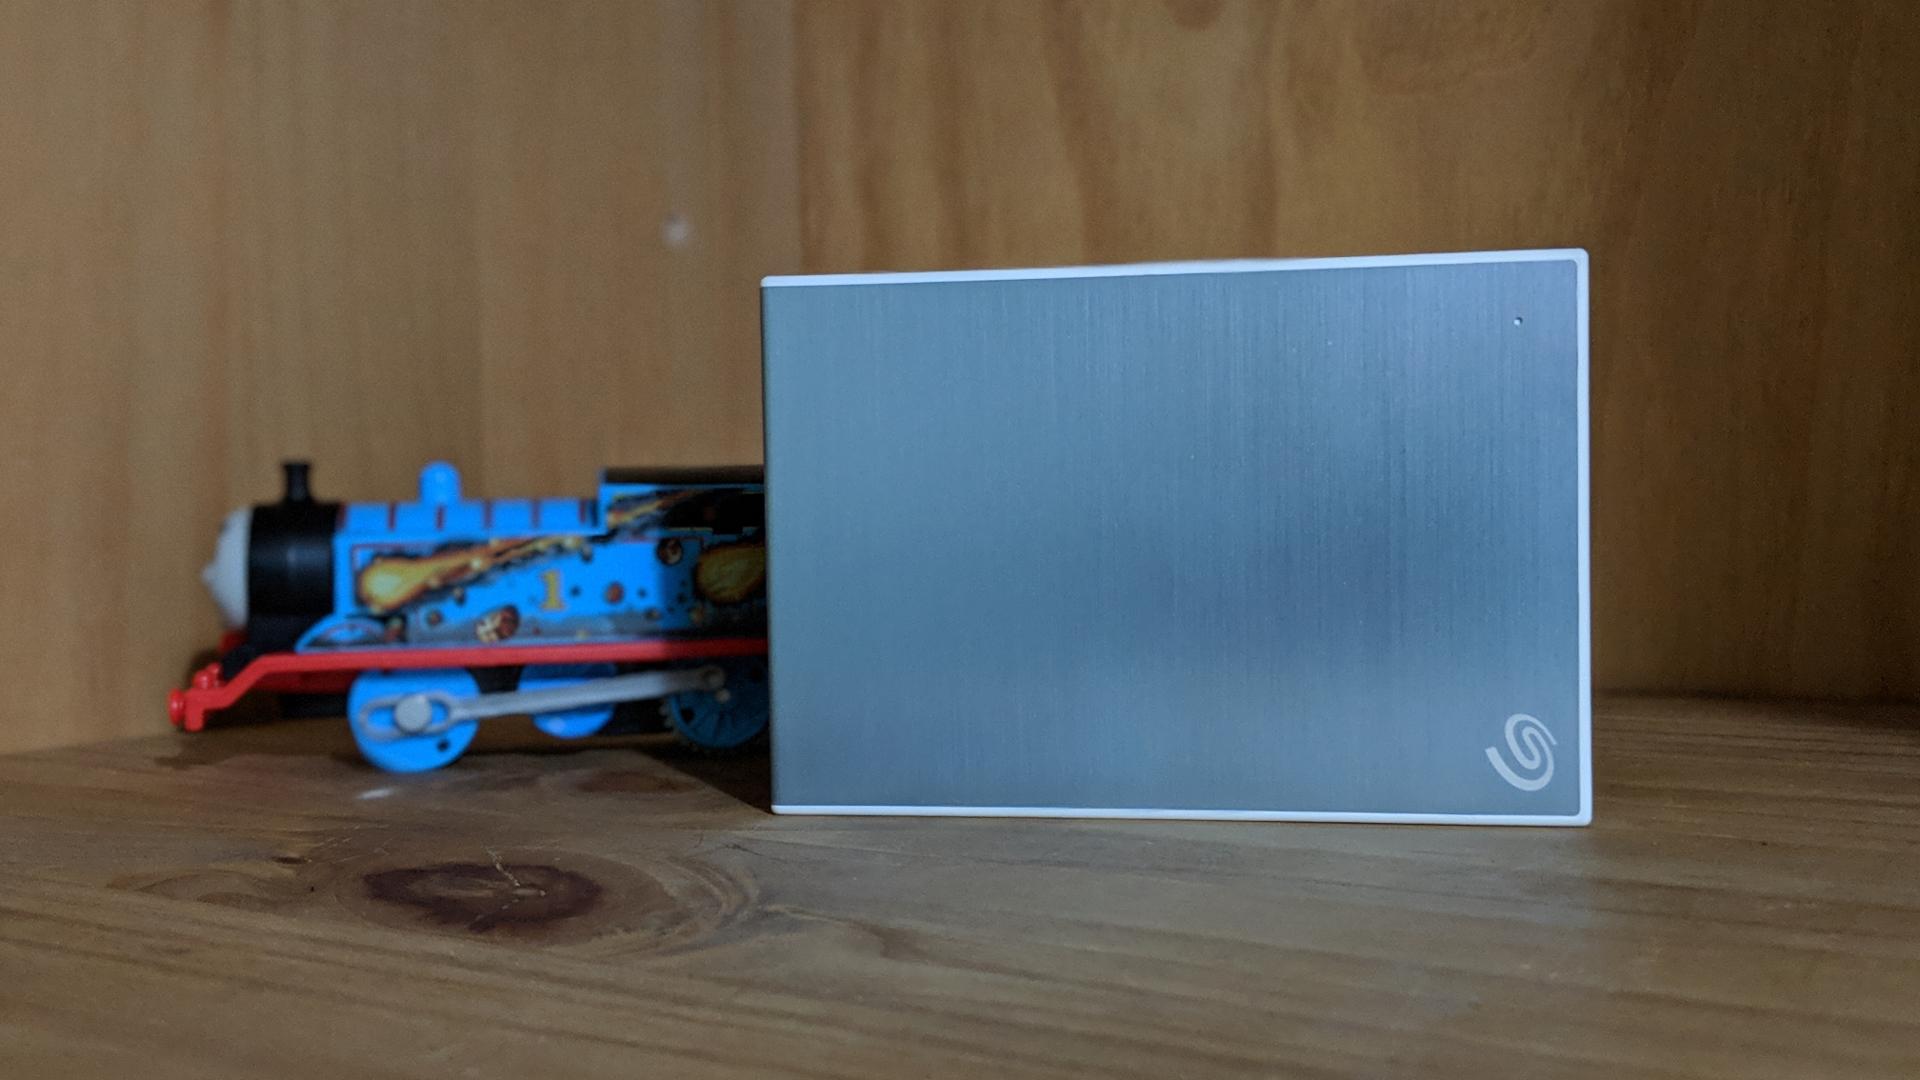 Seagate Backup Plus External Hard Drive Slim Portable 1 Terabyte USB 3.0 BLUE